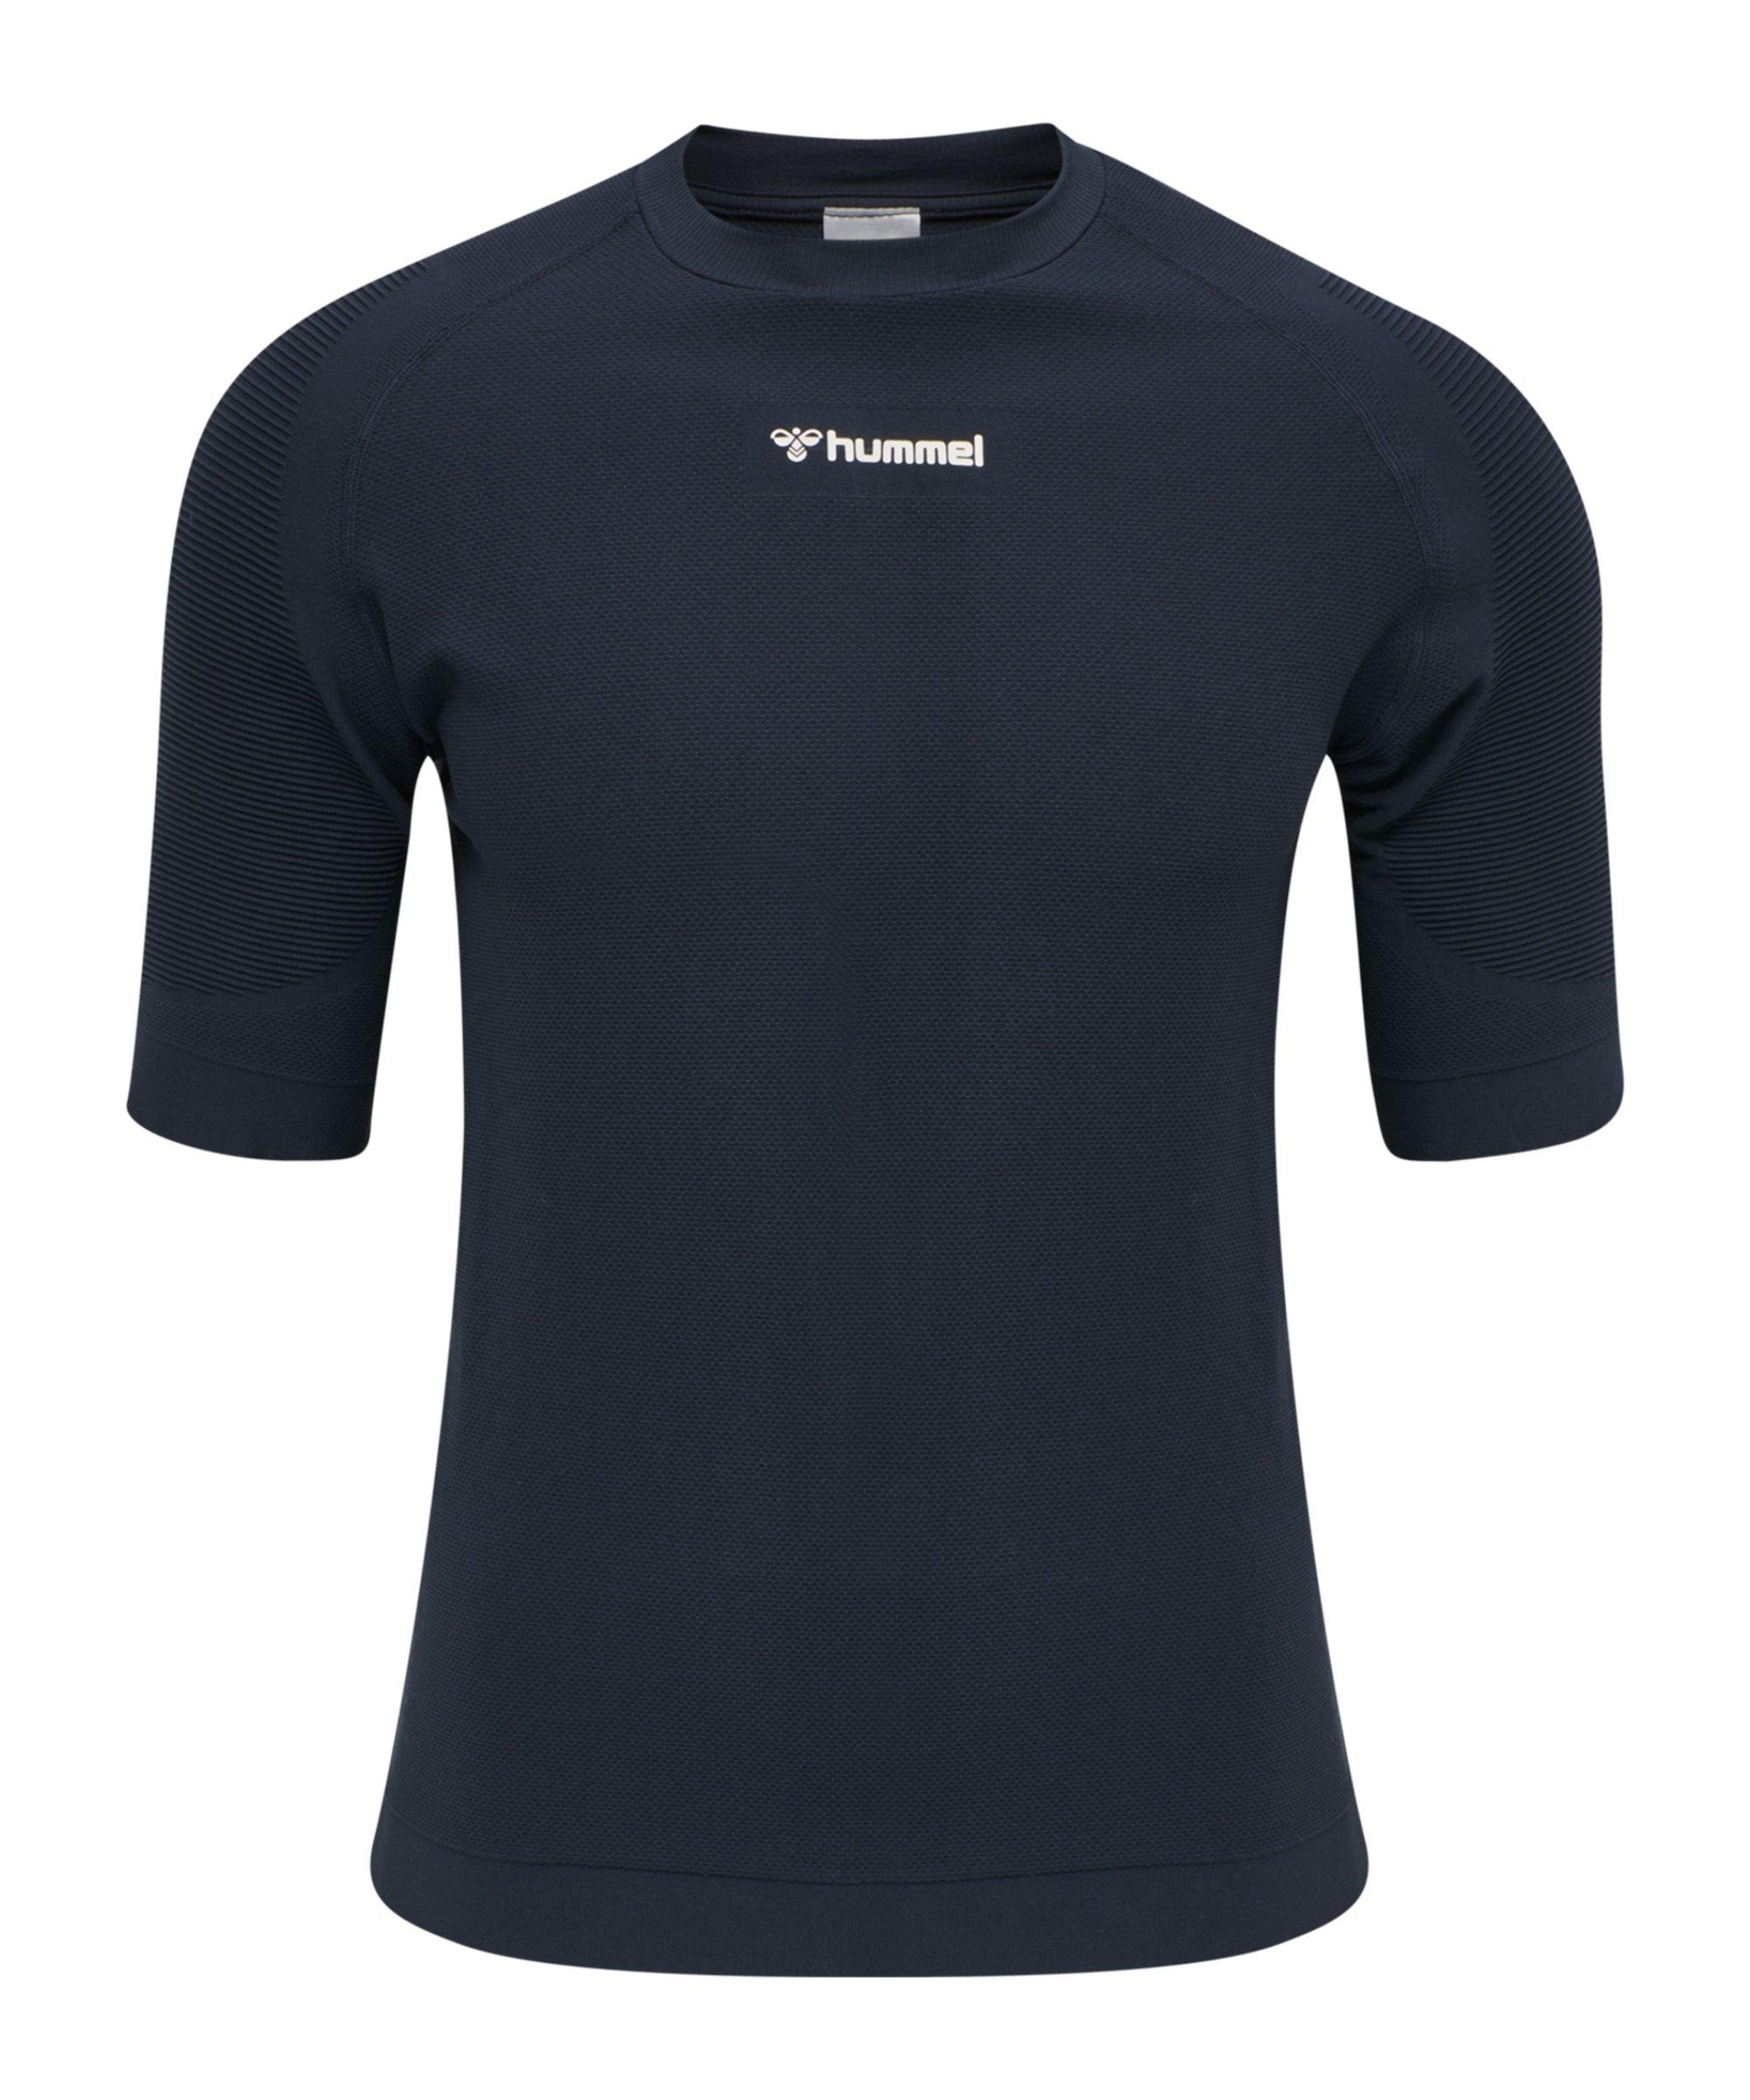 Hummel Cube Seamless T-Shirt Blau F7429 - blau